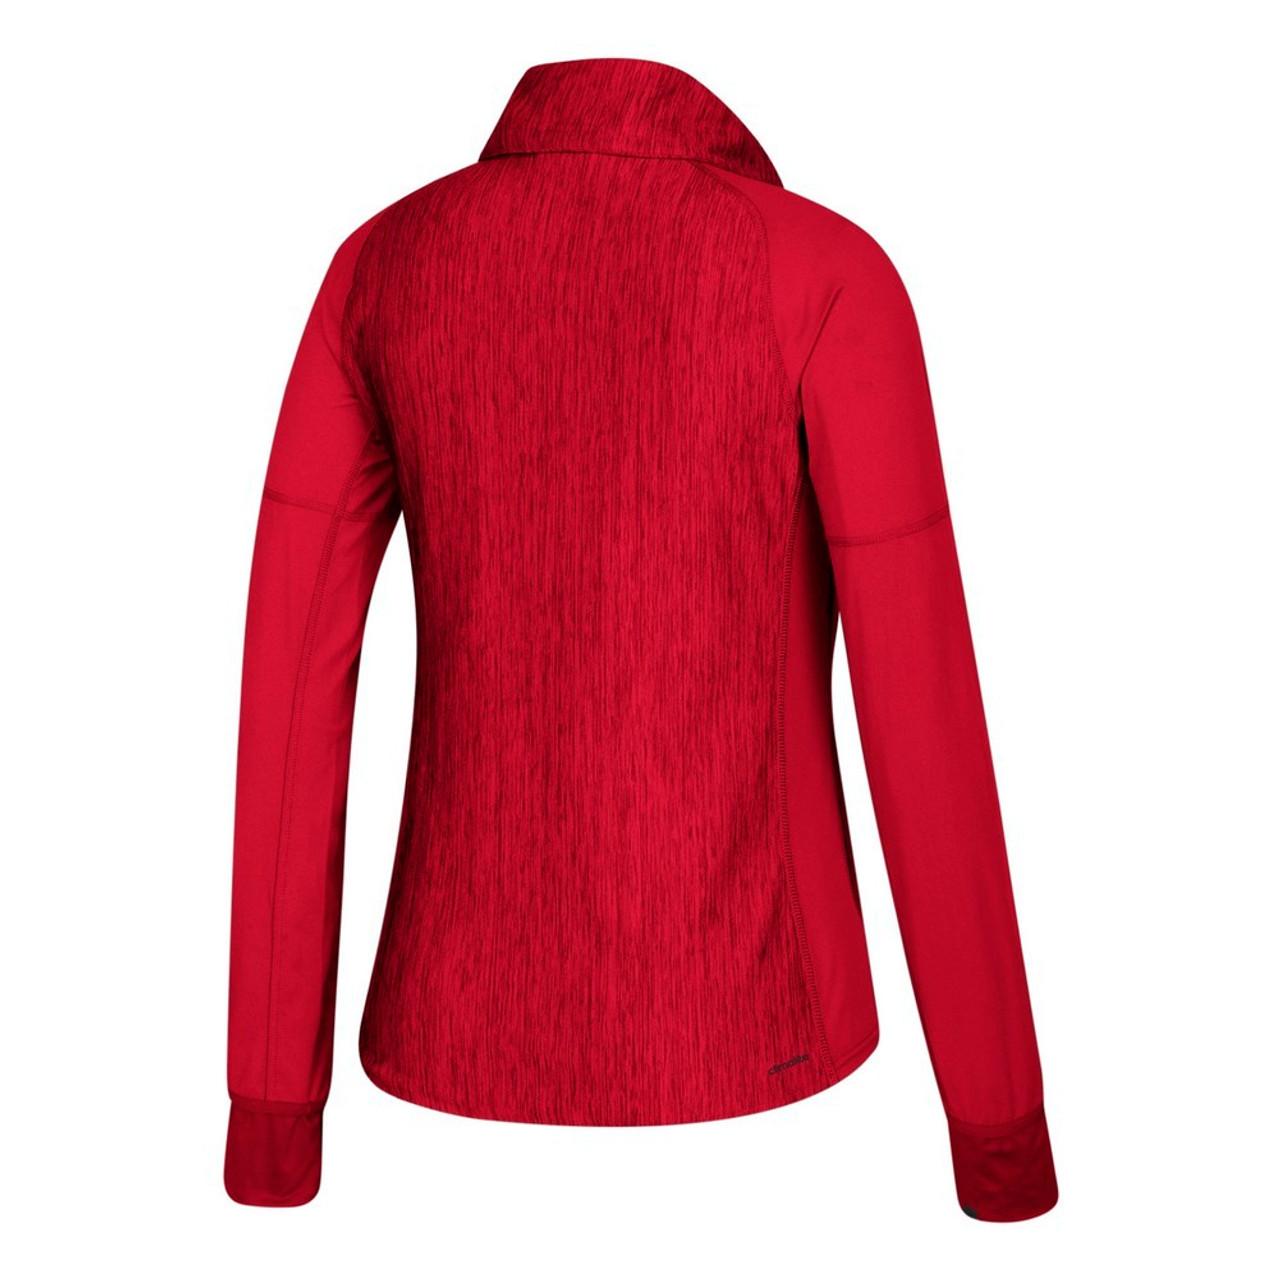 Louisville Cardinals Women's 1/4 Zip Adidas Heathered Jacket